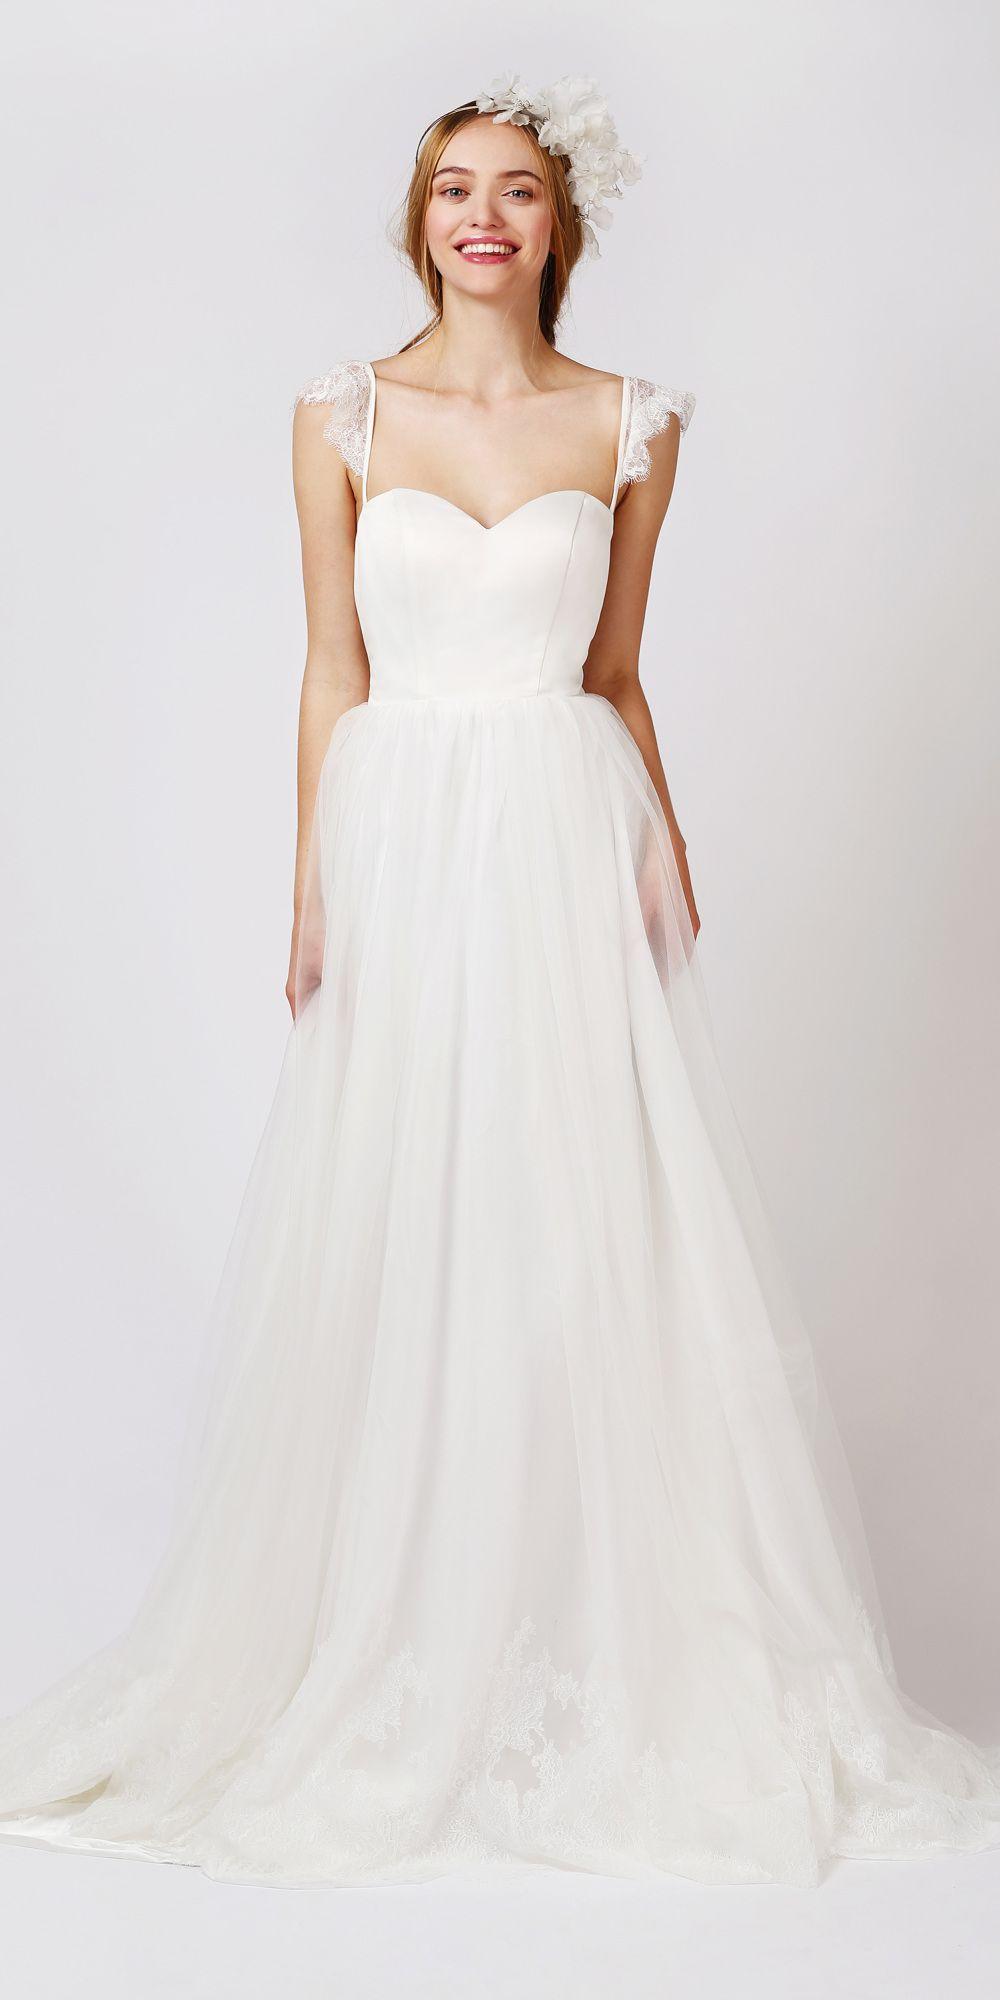 Bridal Gown   The Babushka Ballerina   Bridal Gown Australia   Lace ...